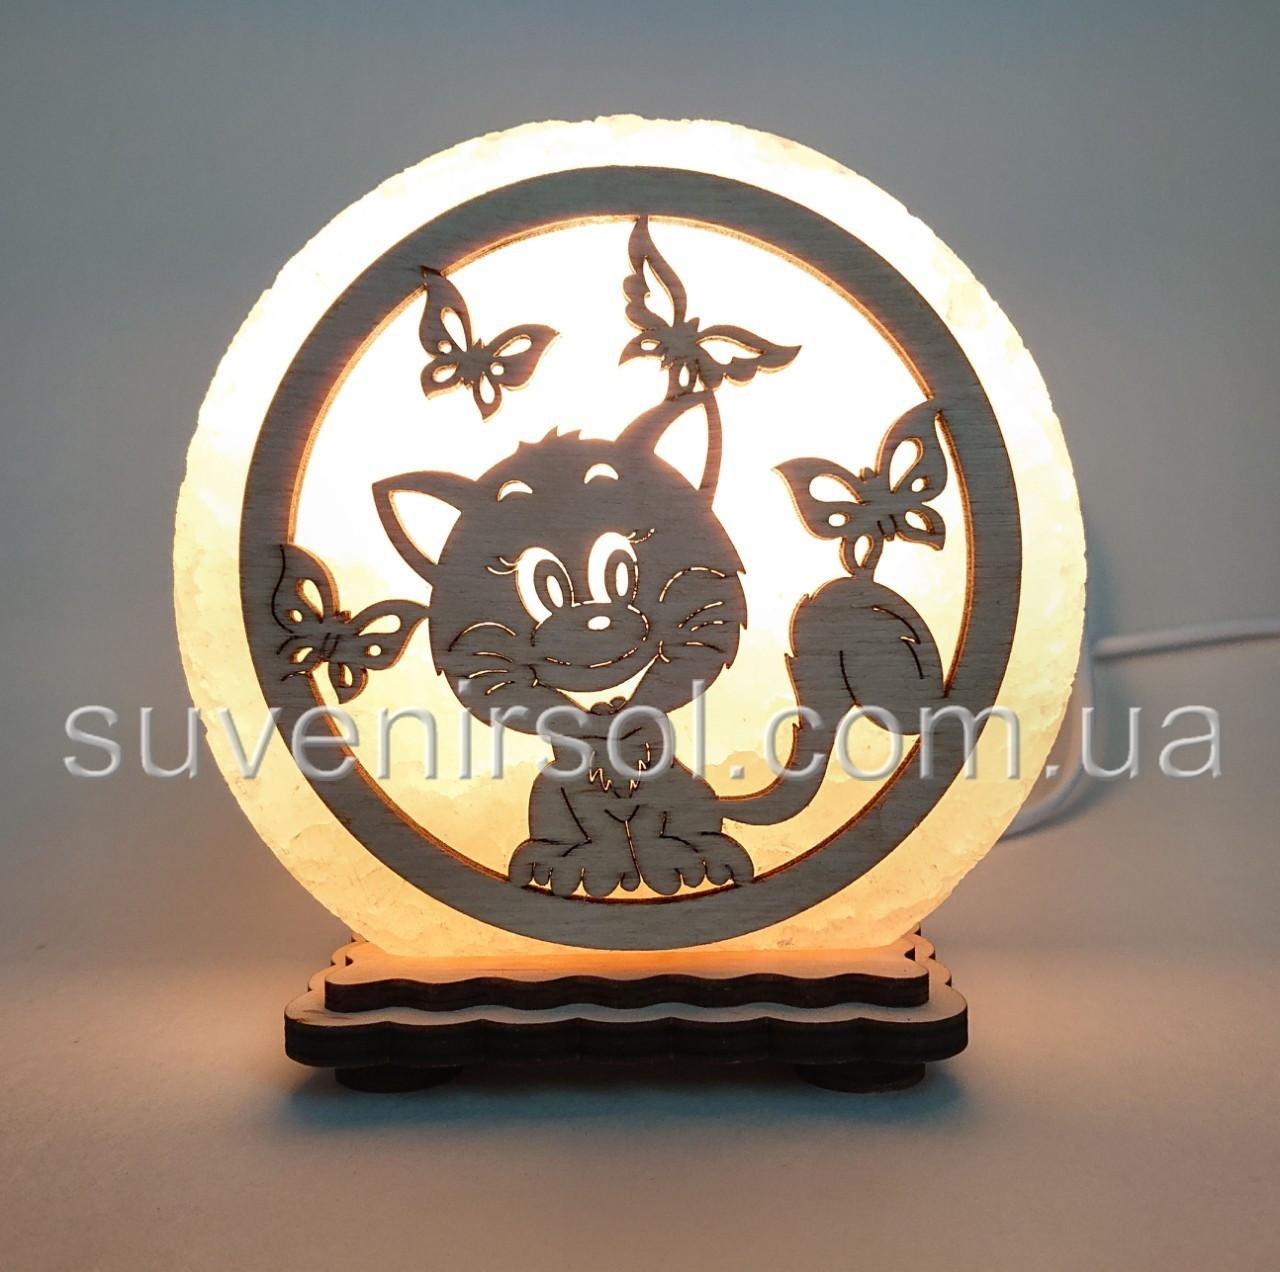 "Соляная лампа круглая маленькая ""Кот и бабочки"""